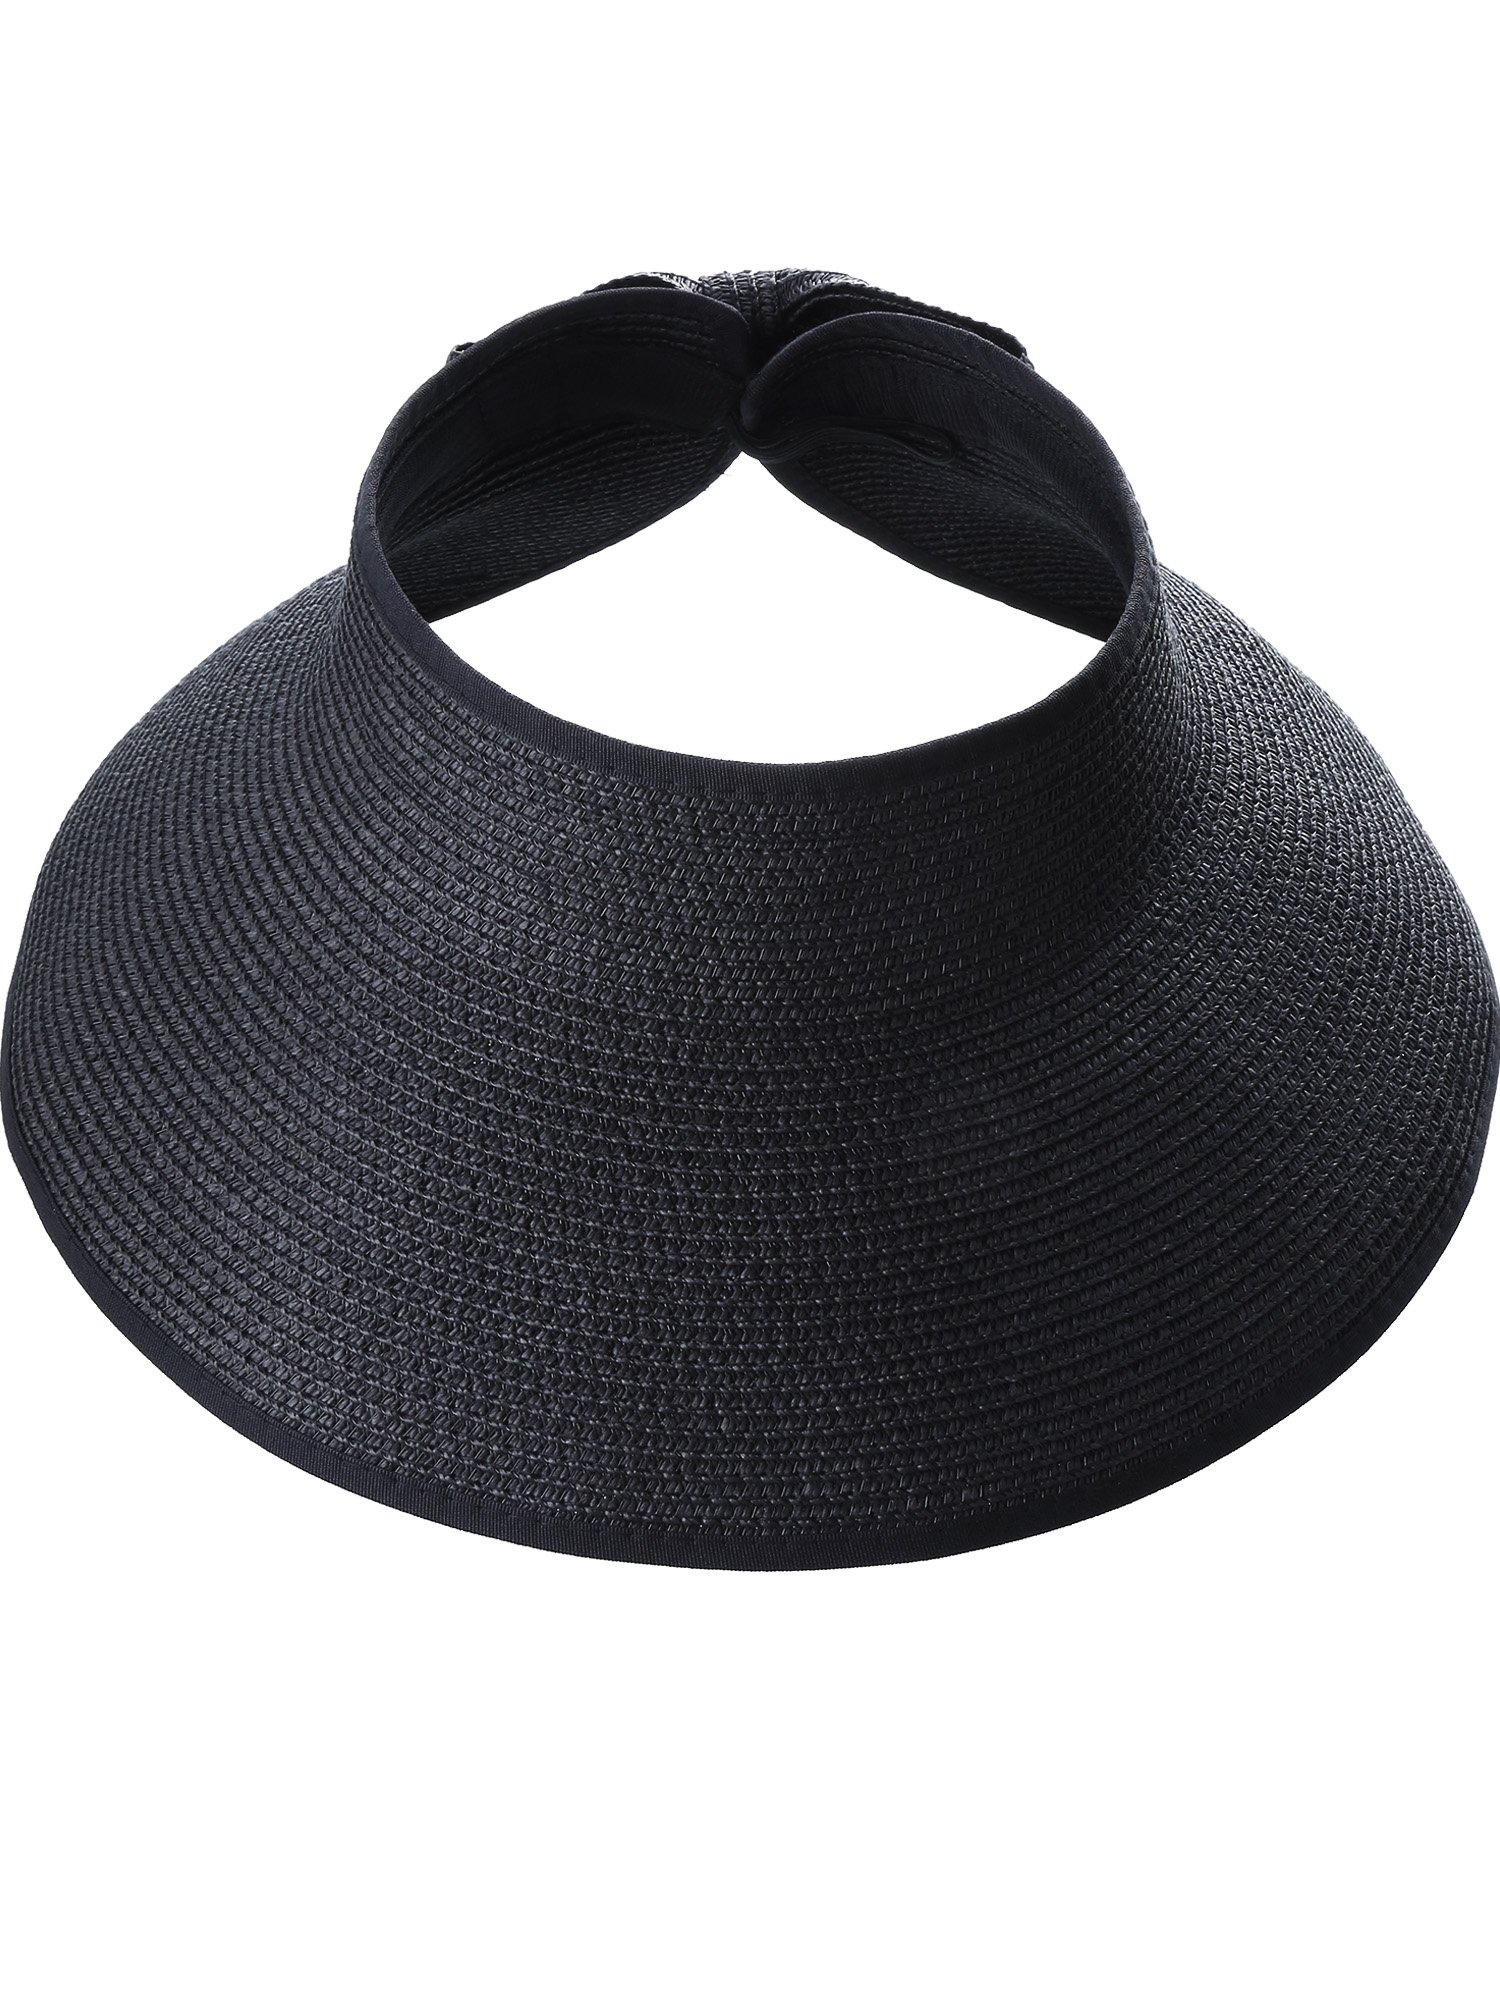 Hestya Women's Wide Brim Roll-up Straw Sun Visor Packable Foldable Sun Visor Beach Open Top Hat (Black)